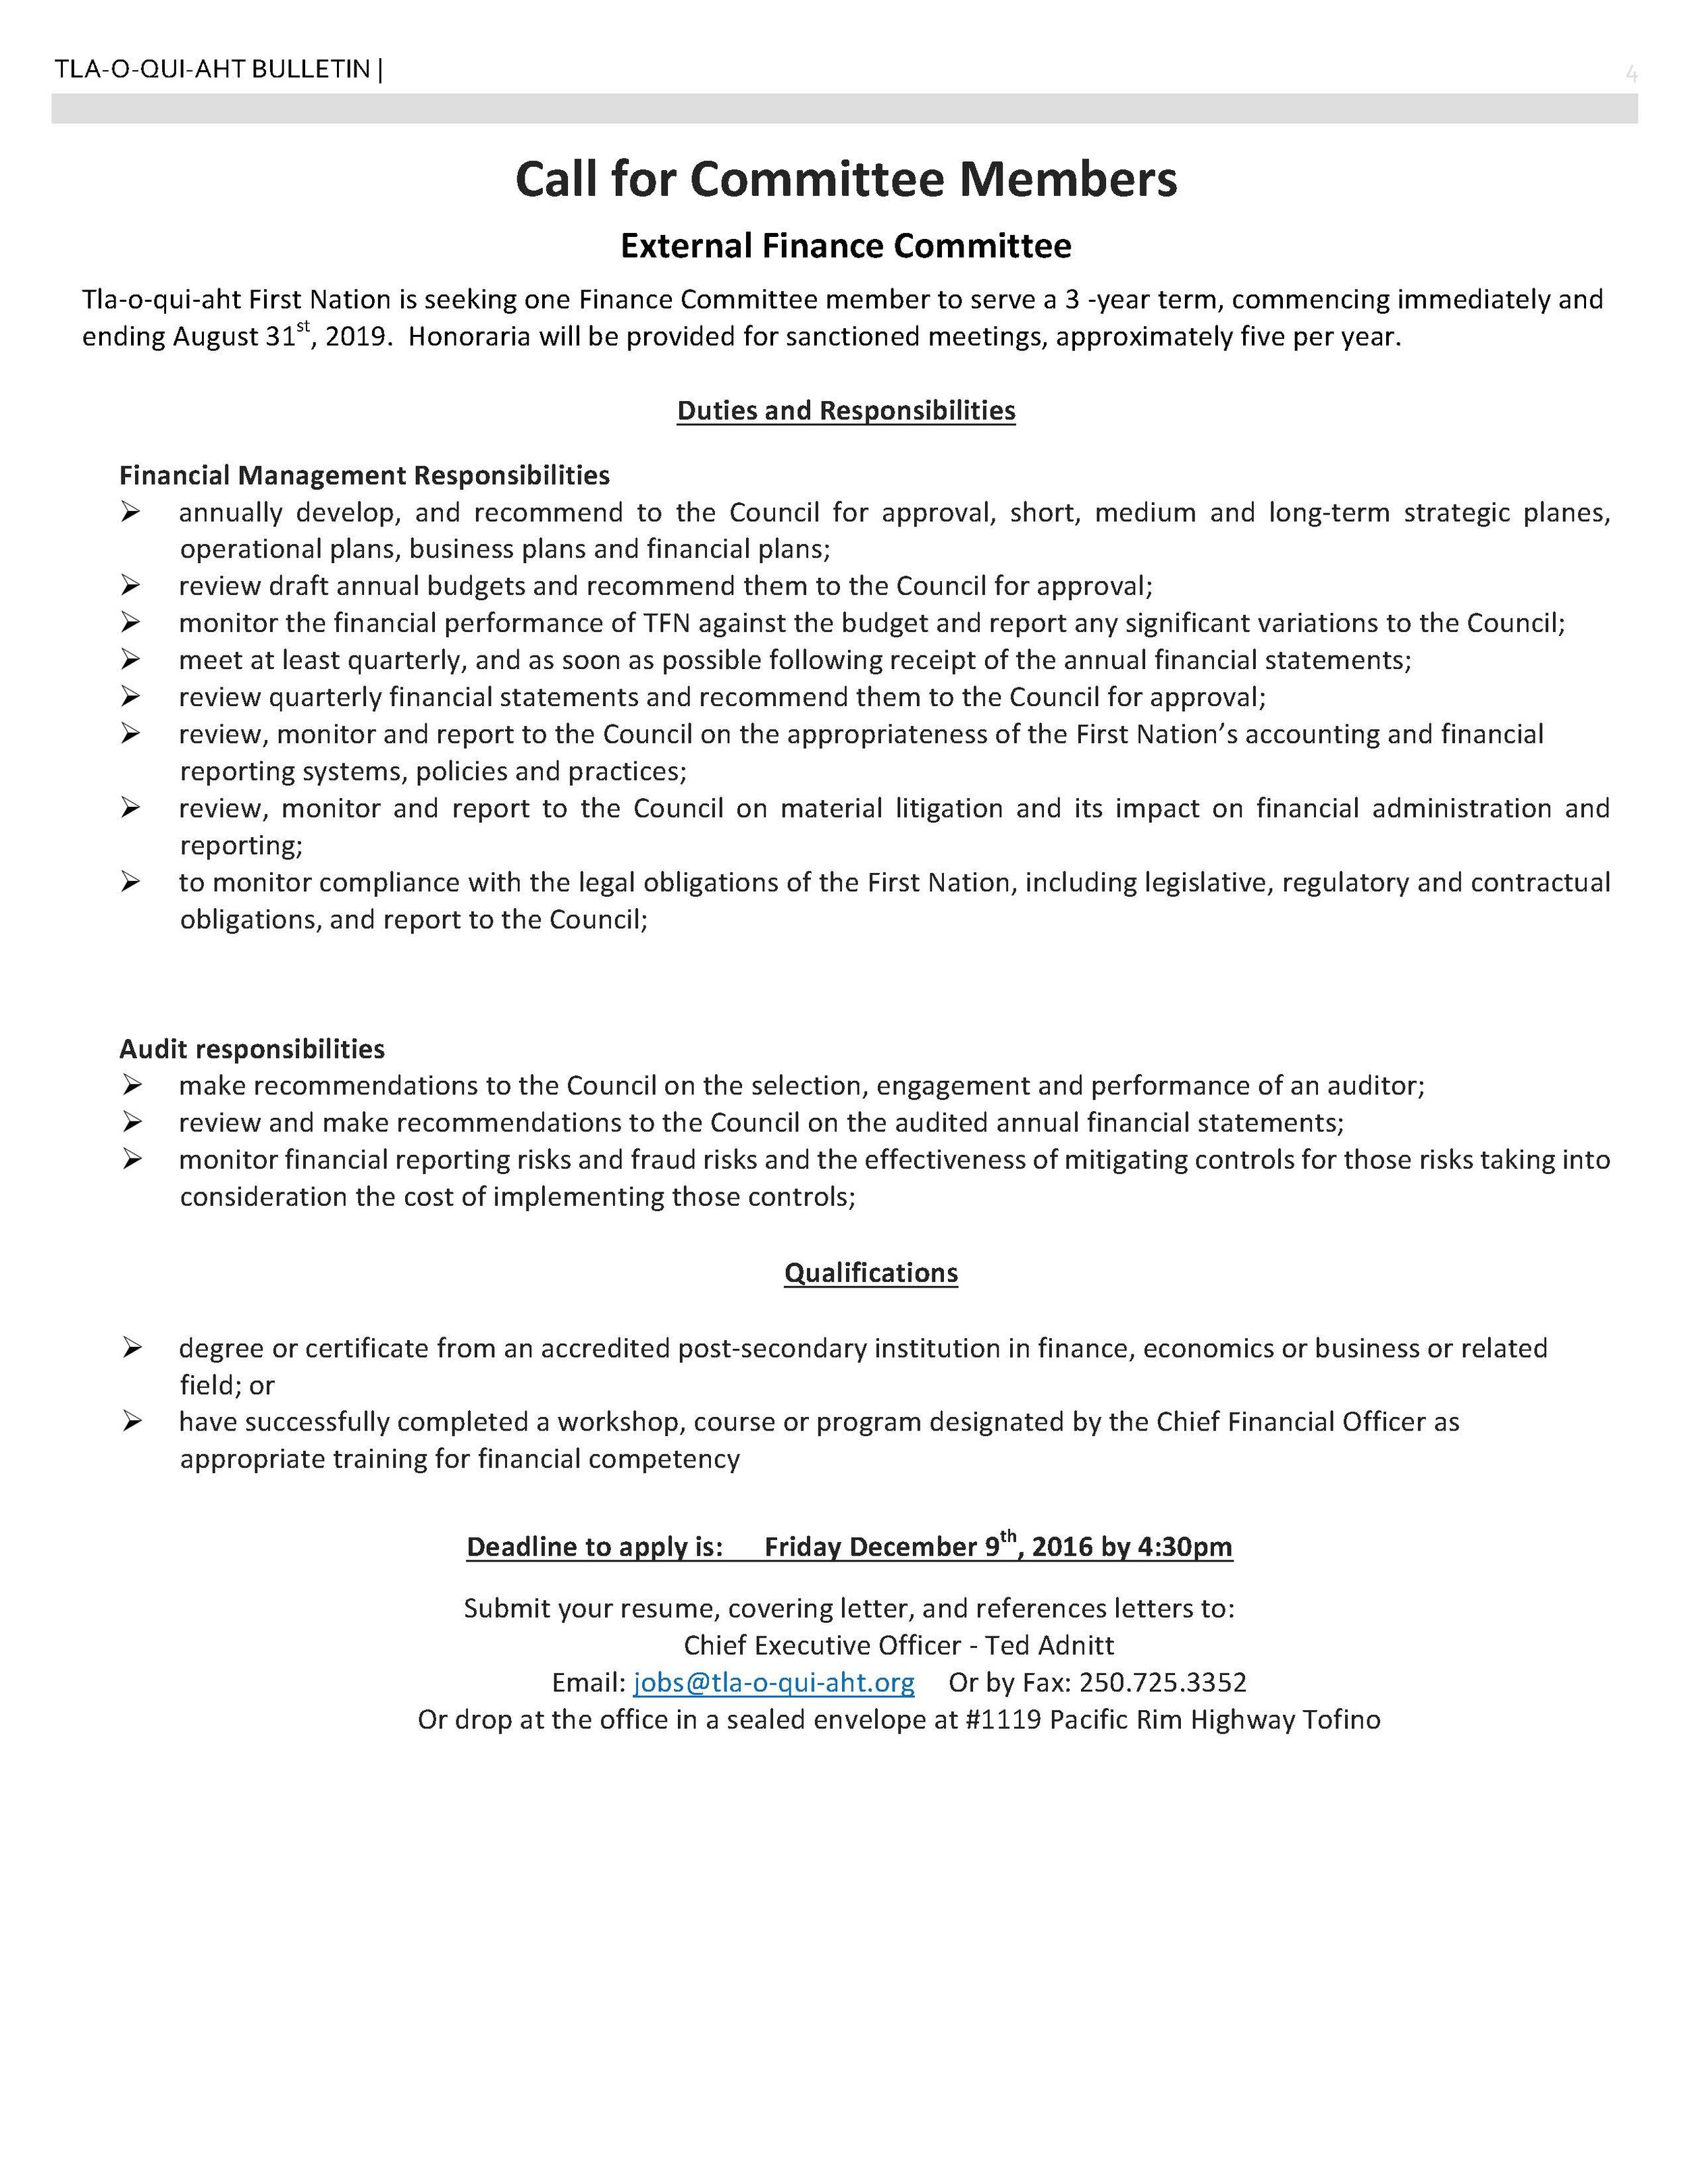 0TFN Bulletin Nov 15-2016_Page_04.jpg